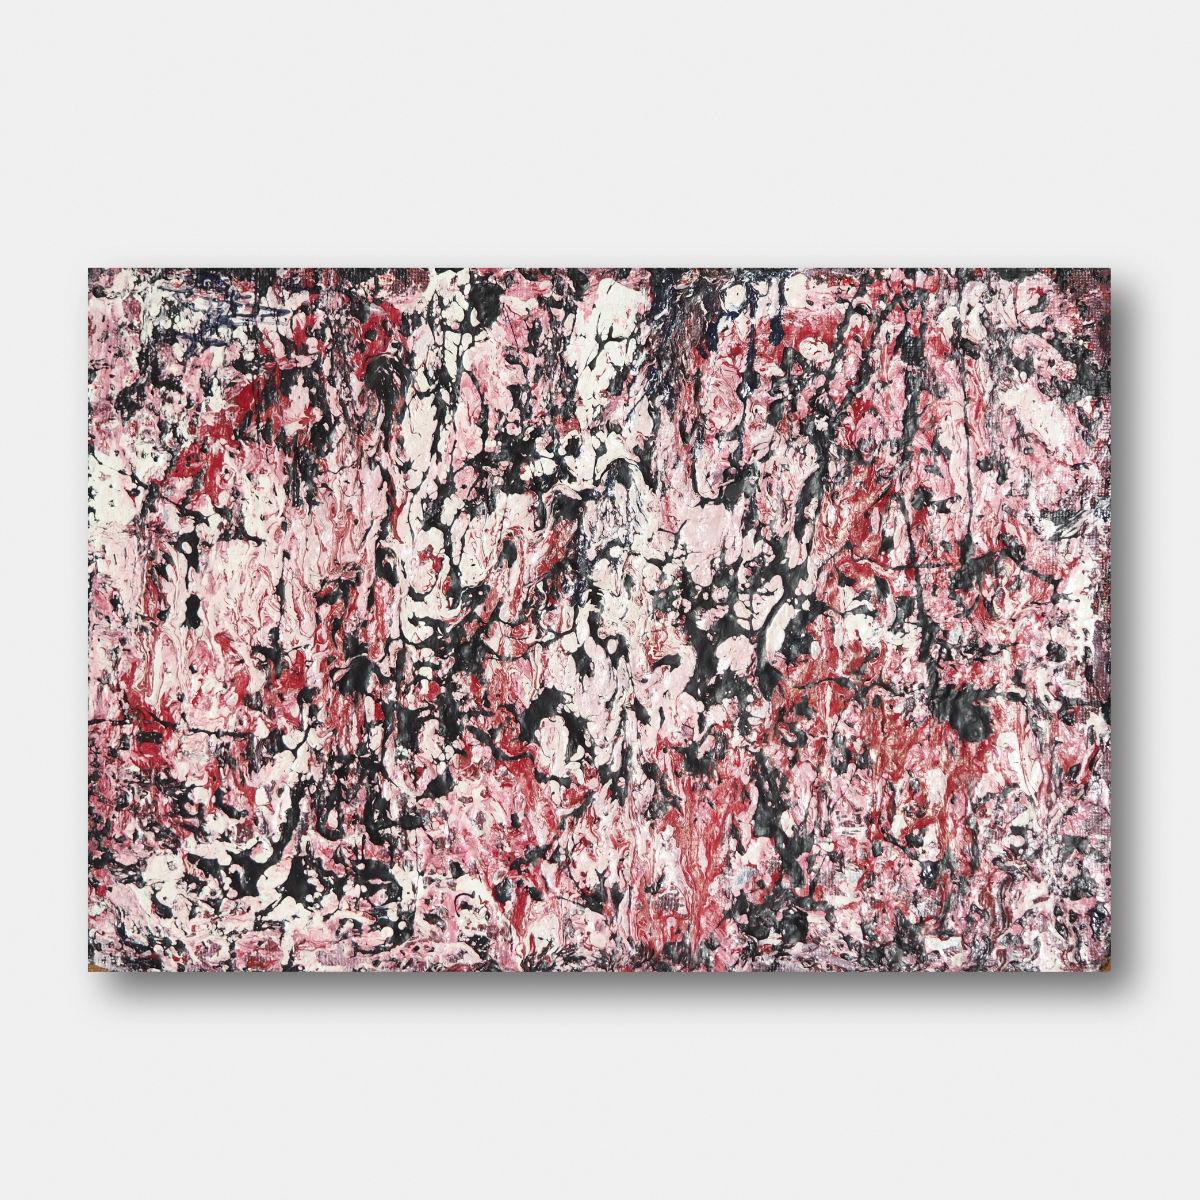 Acrylic painting, 60's / 70's. - € 600